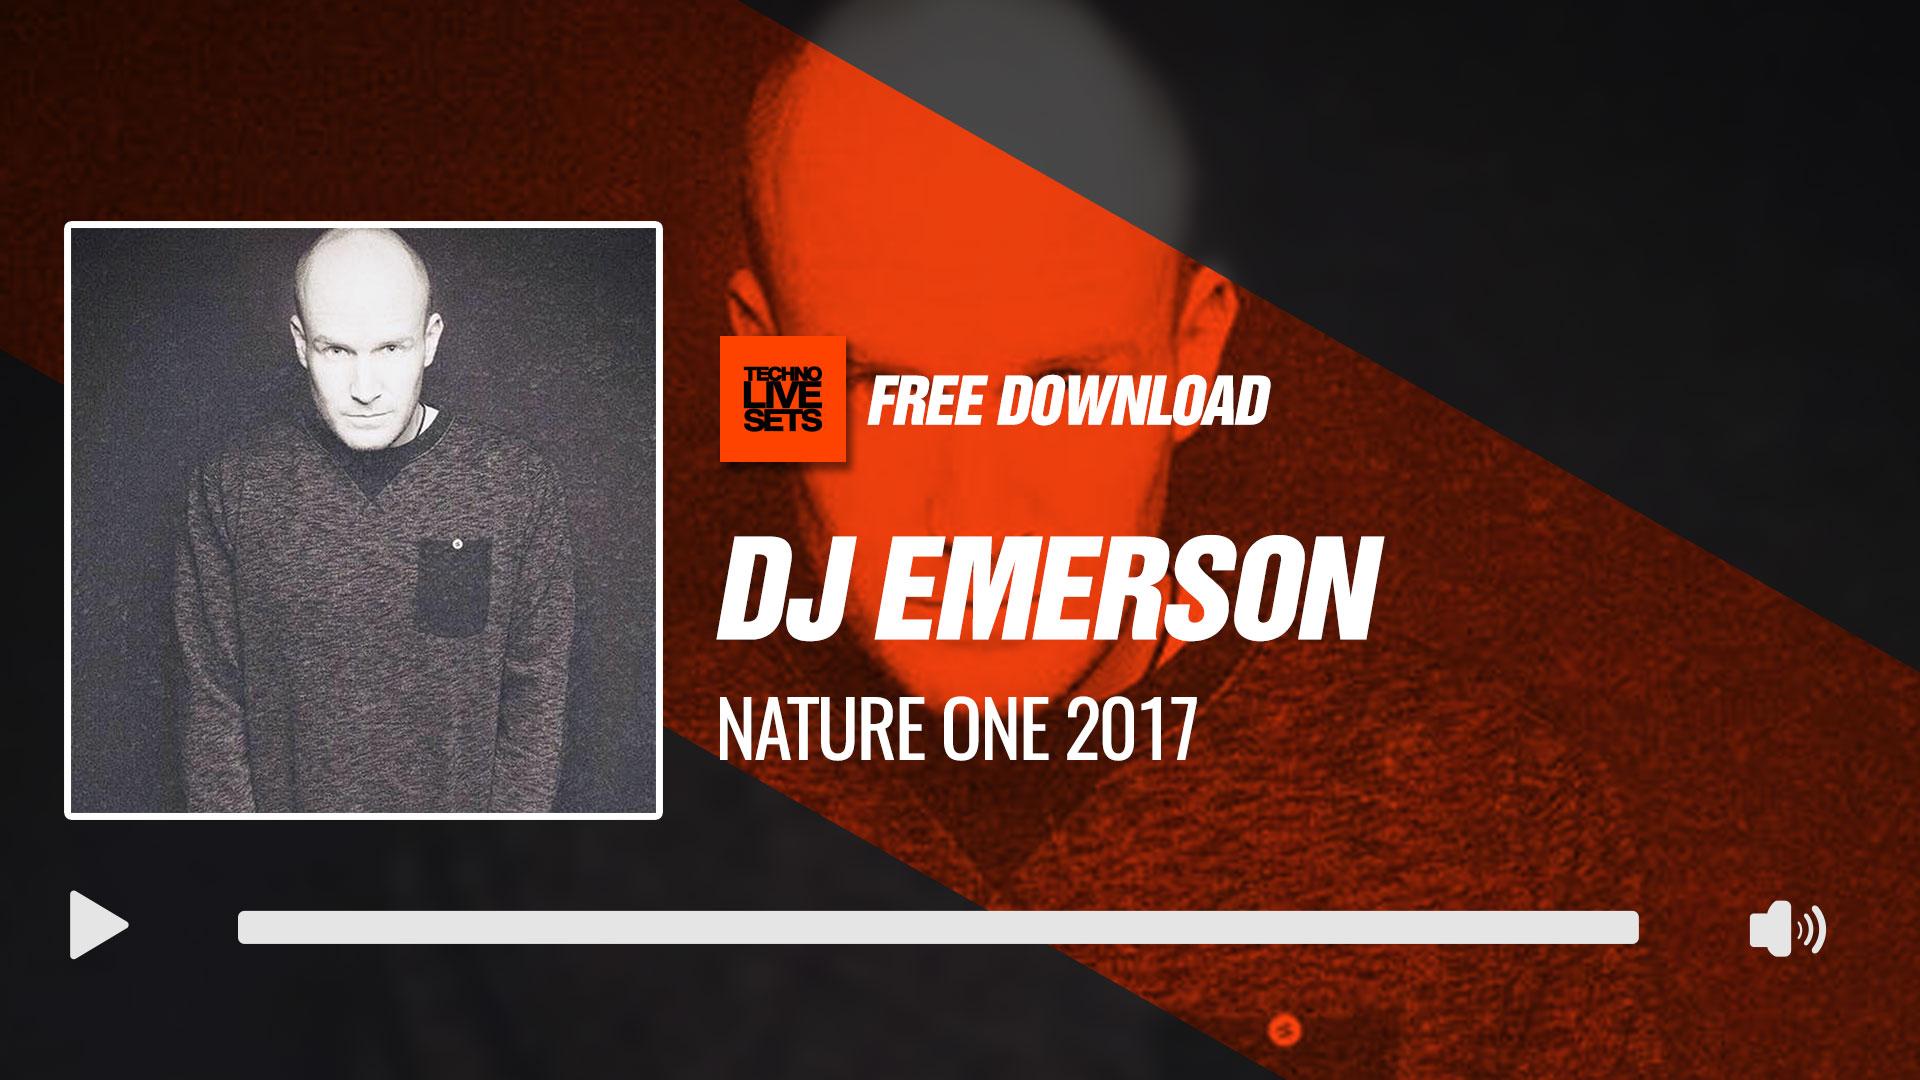 Dj emerson 2017 nature one 2017 08 05 2017 for Canape trossingen